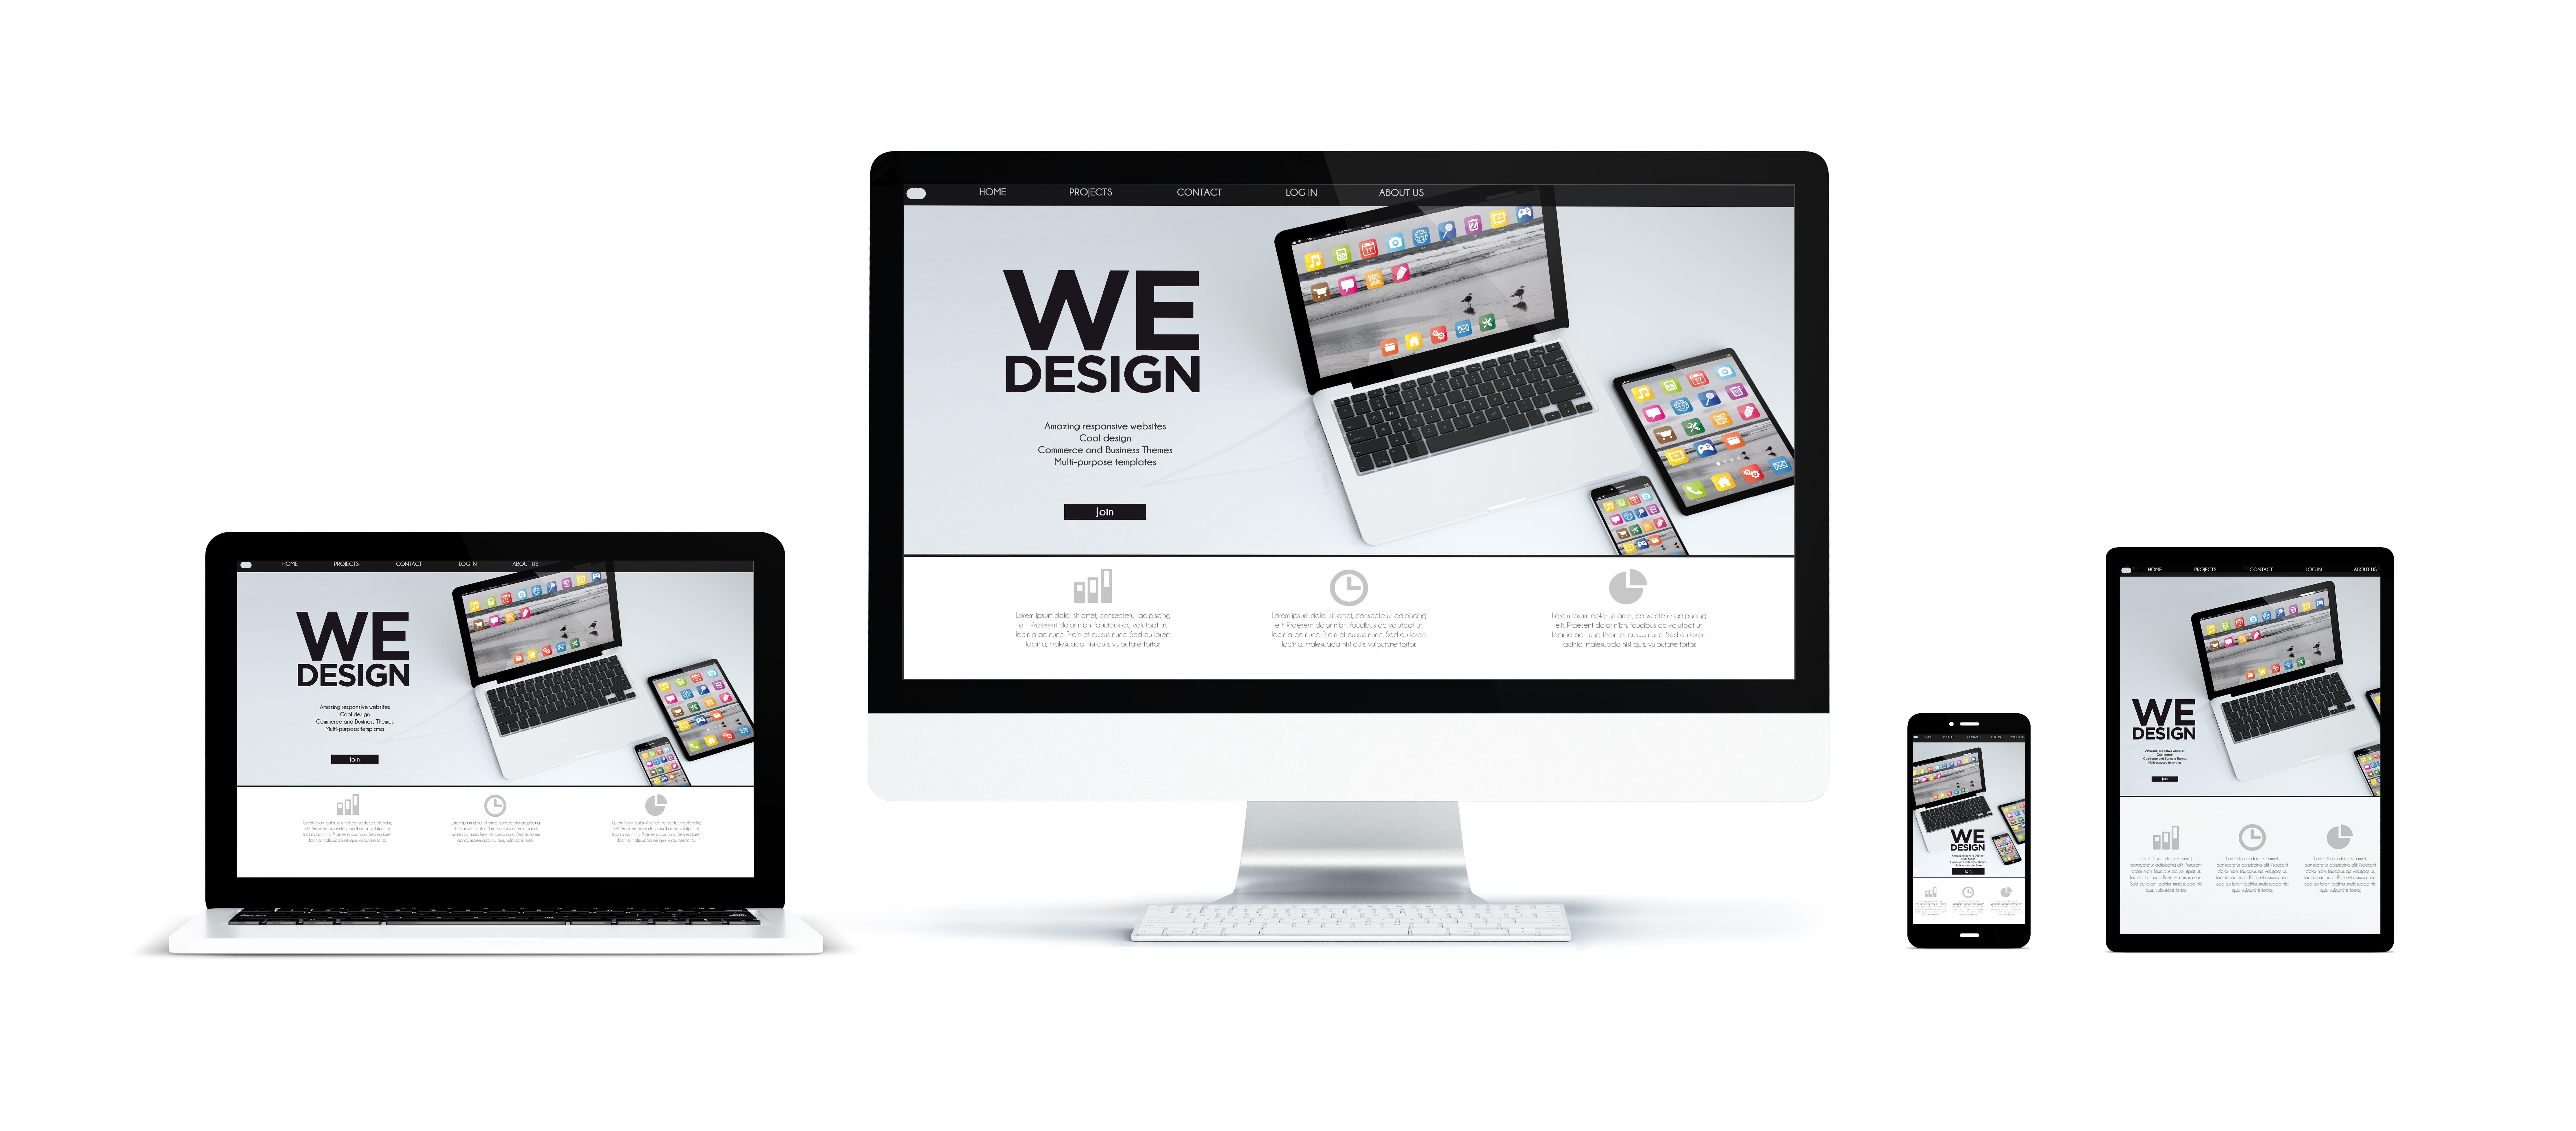 Athens Web - Κατασκευή Ιστοσελίδων & Mobile Apps